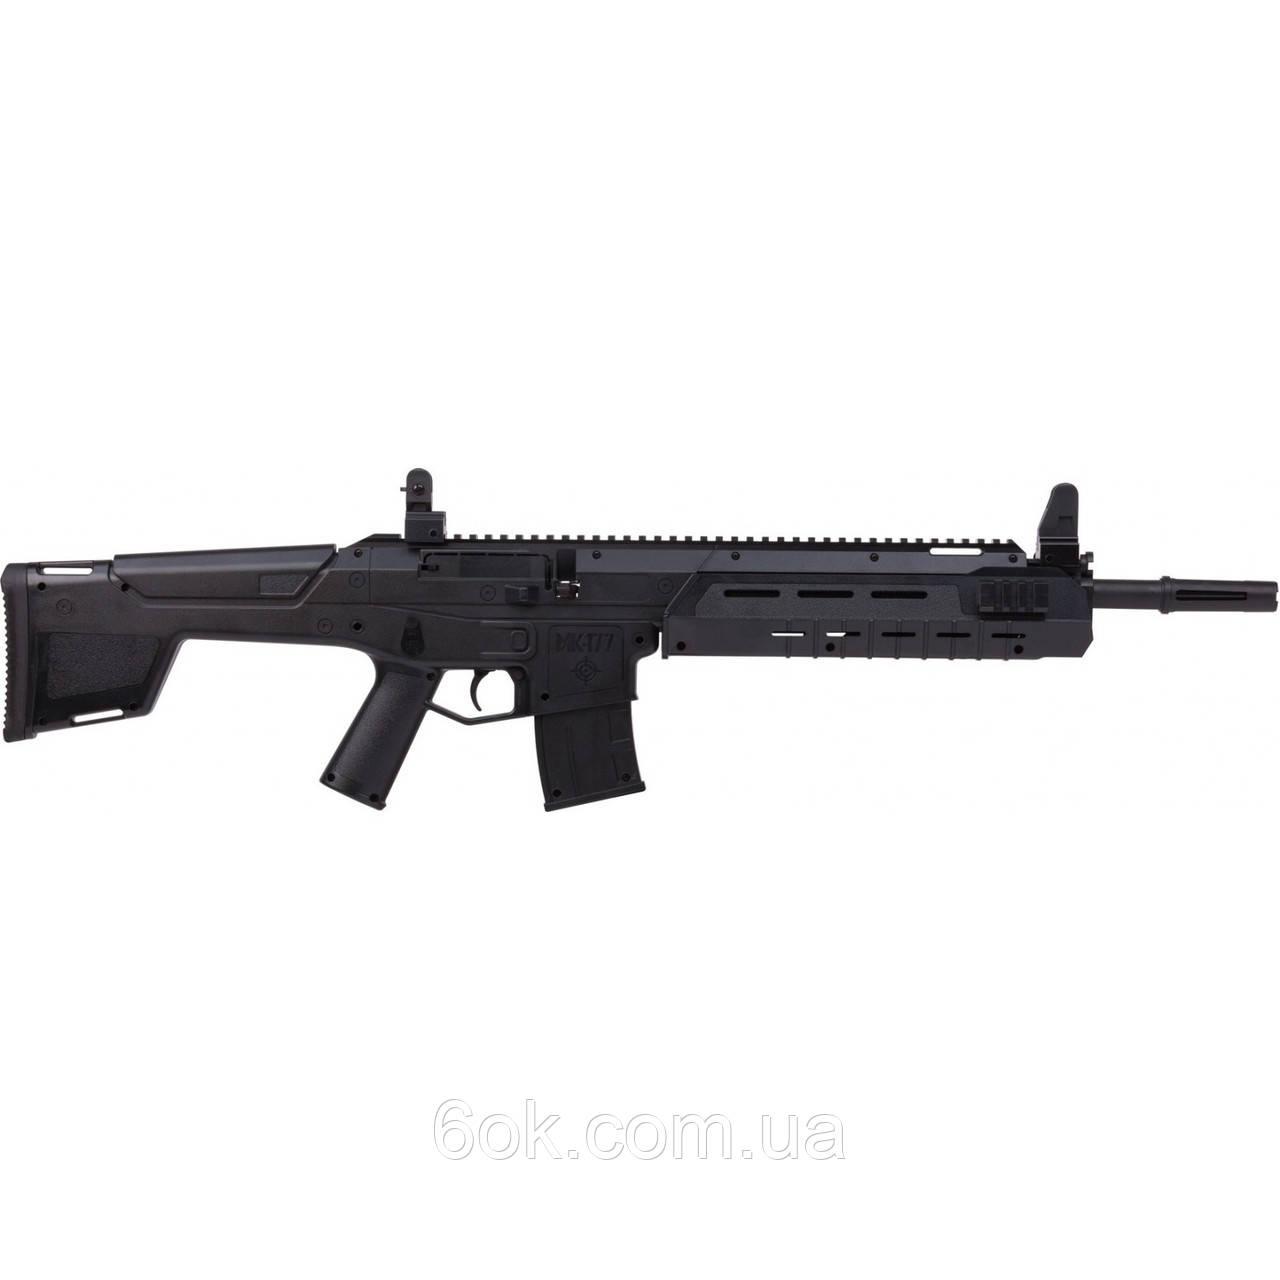 30117 Винтовка пневматическая Crosman MK-177 |чорна